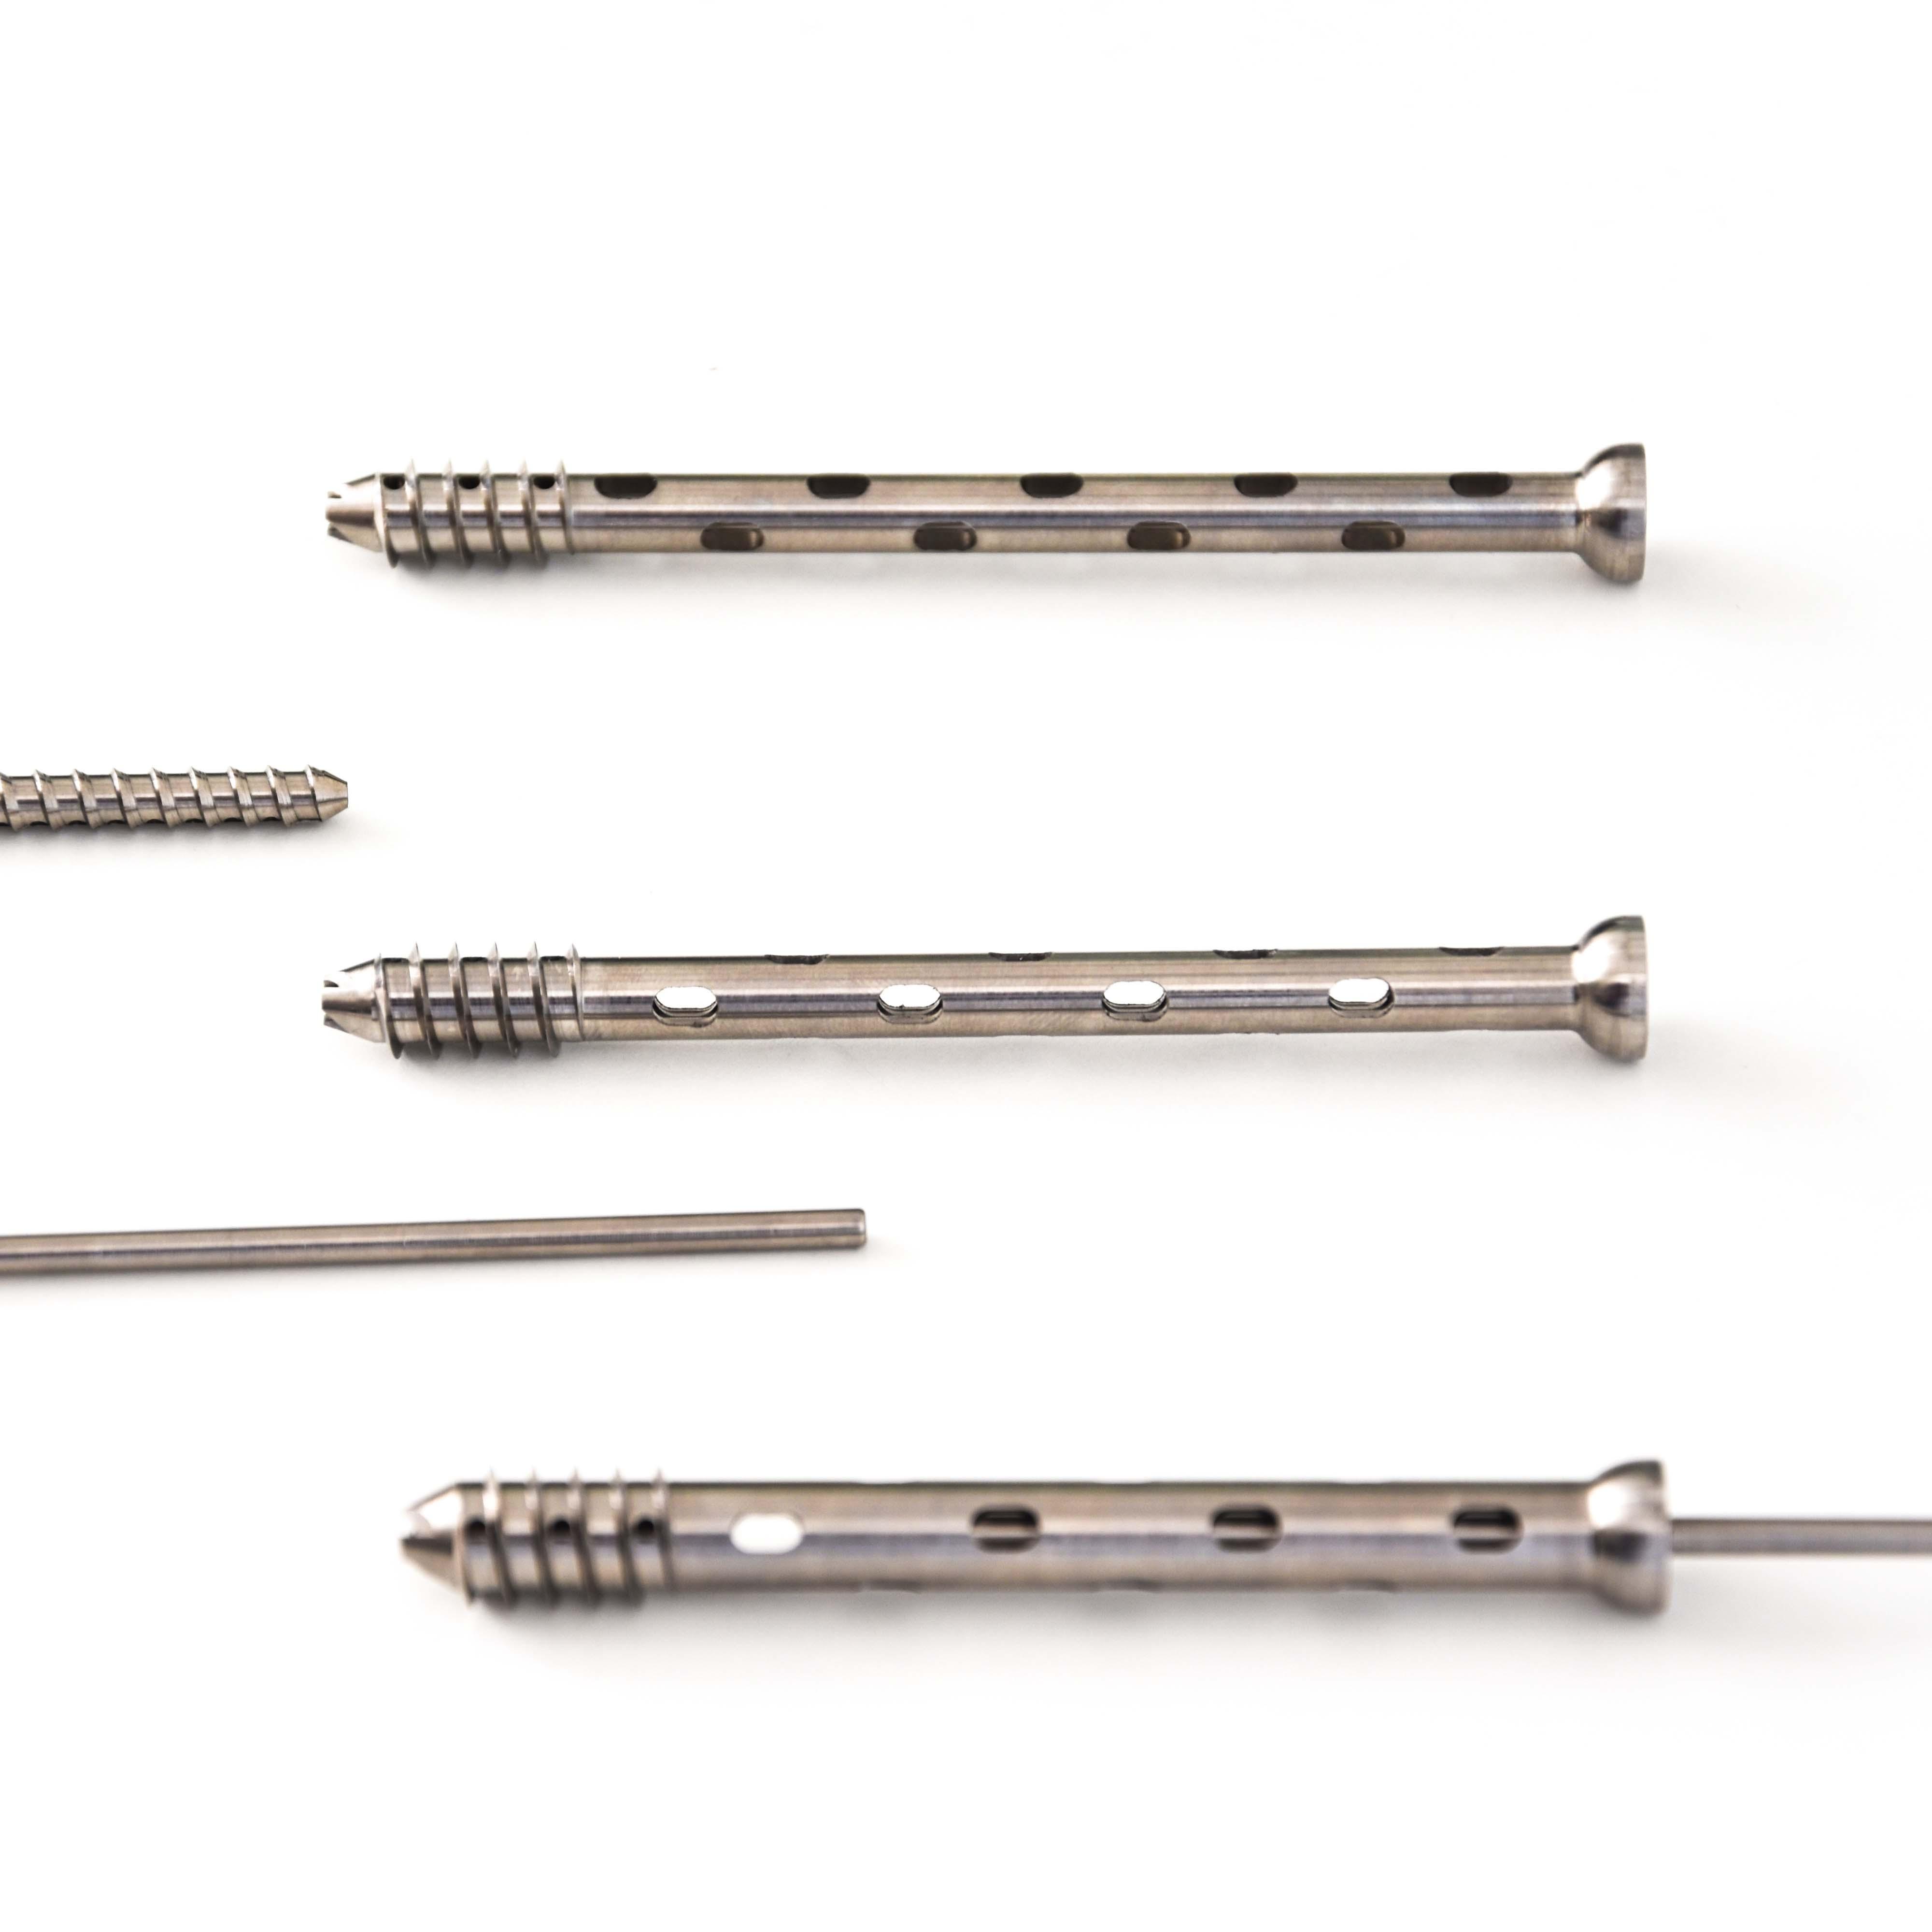 Cannulated orthopedic screws